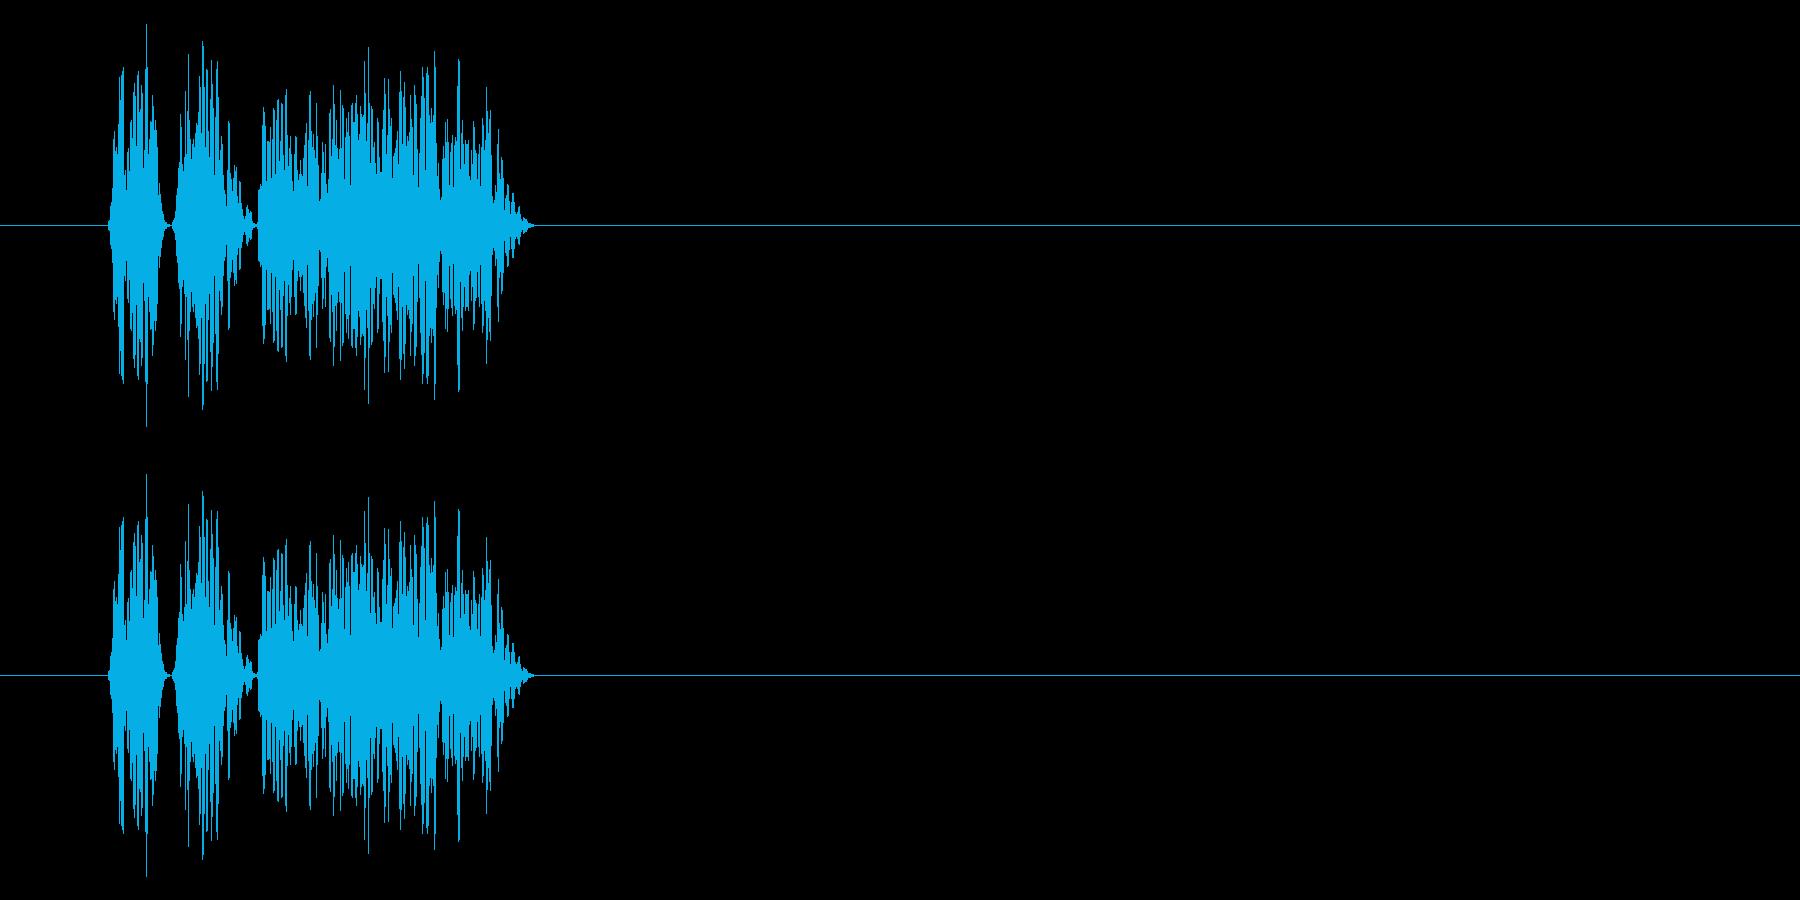 SNES 格闘06-06(ヒット)の再生済みの波形